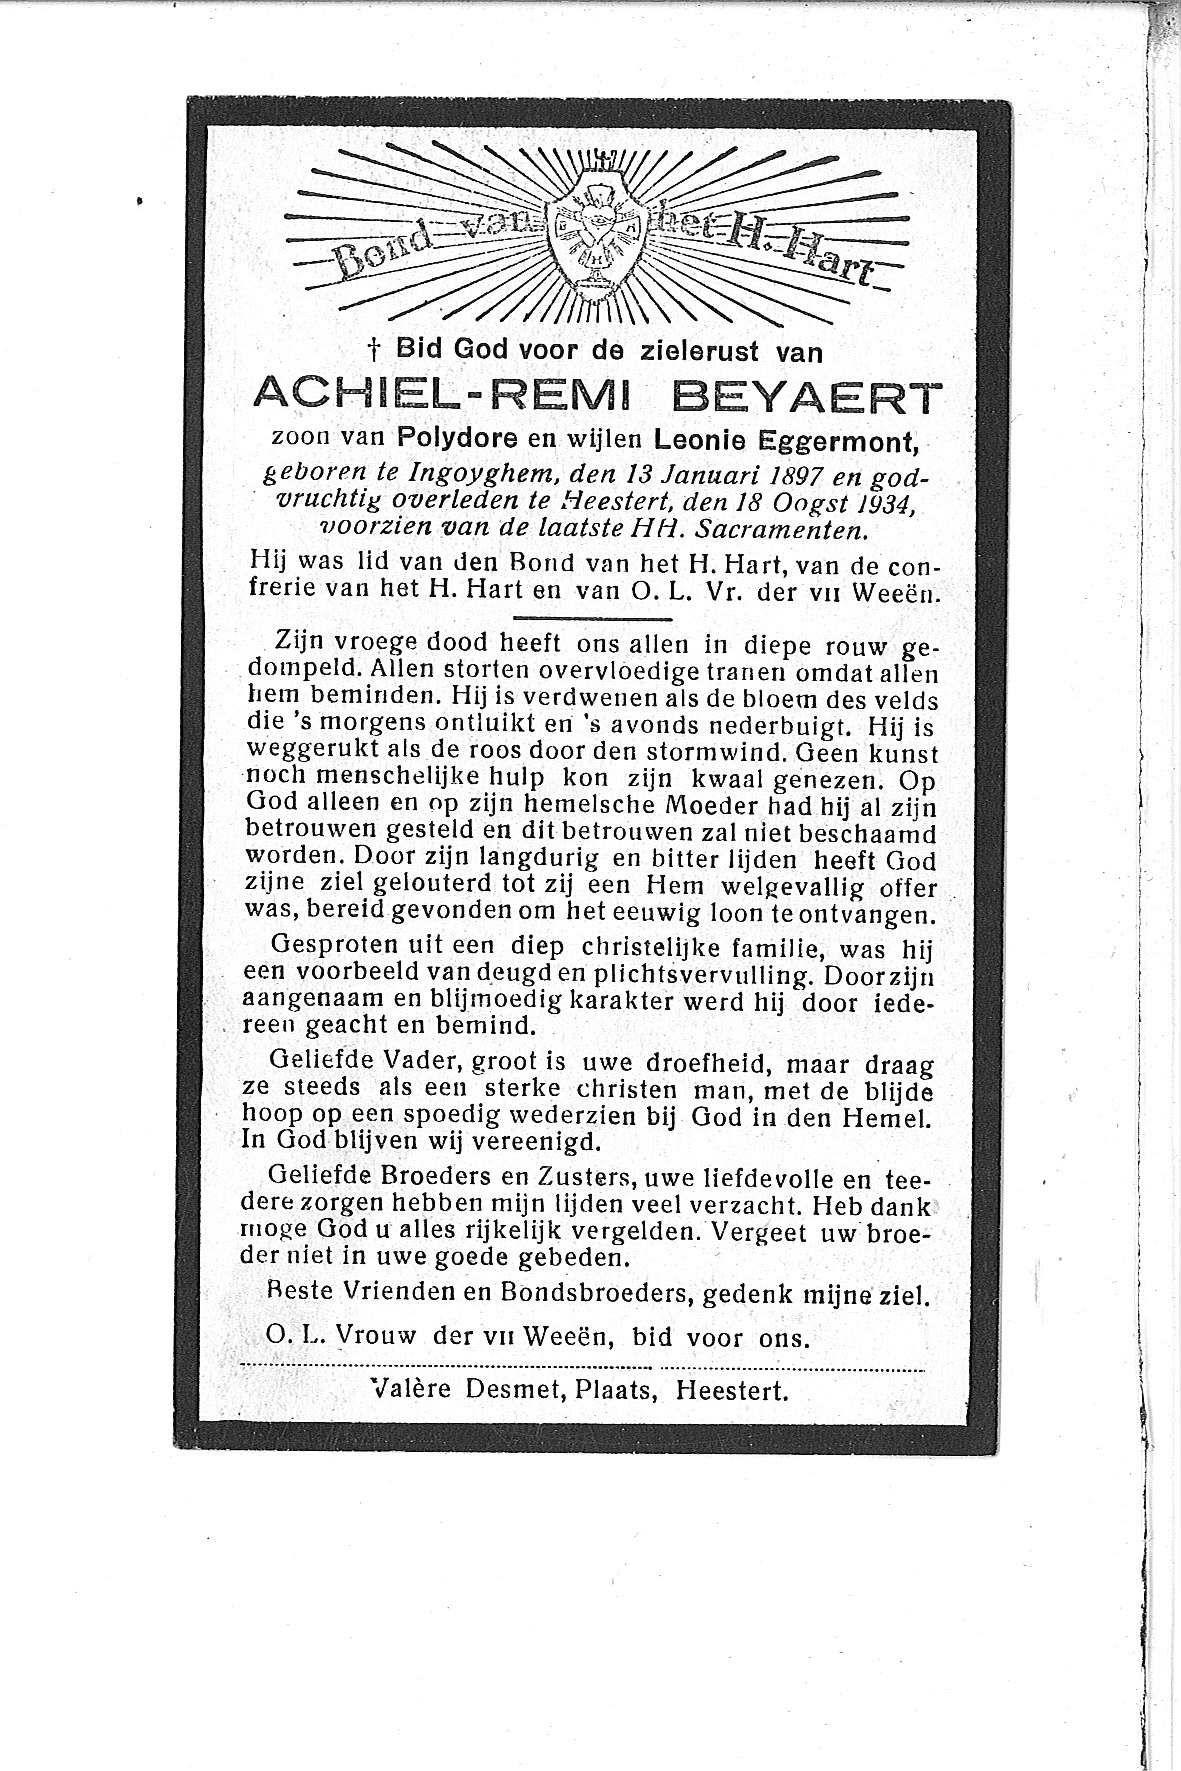 Achiel-Remi (1934) 20110222155821_00001.jpg